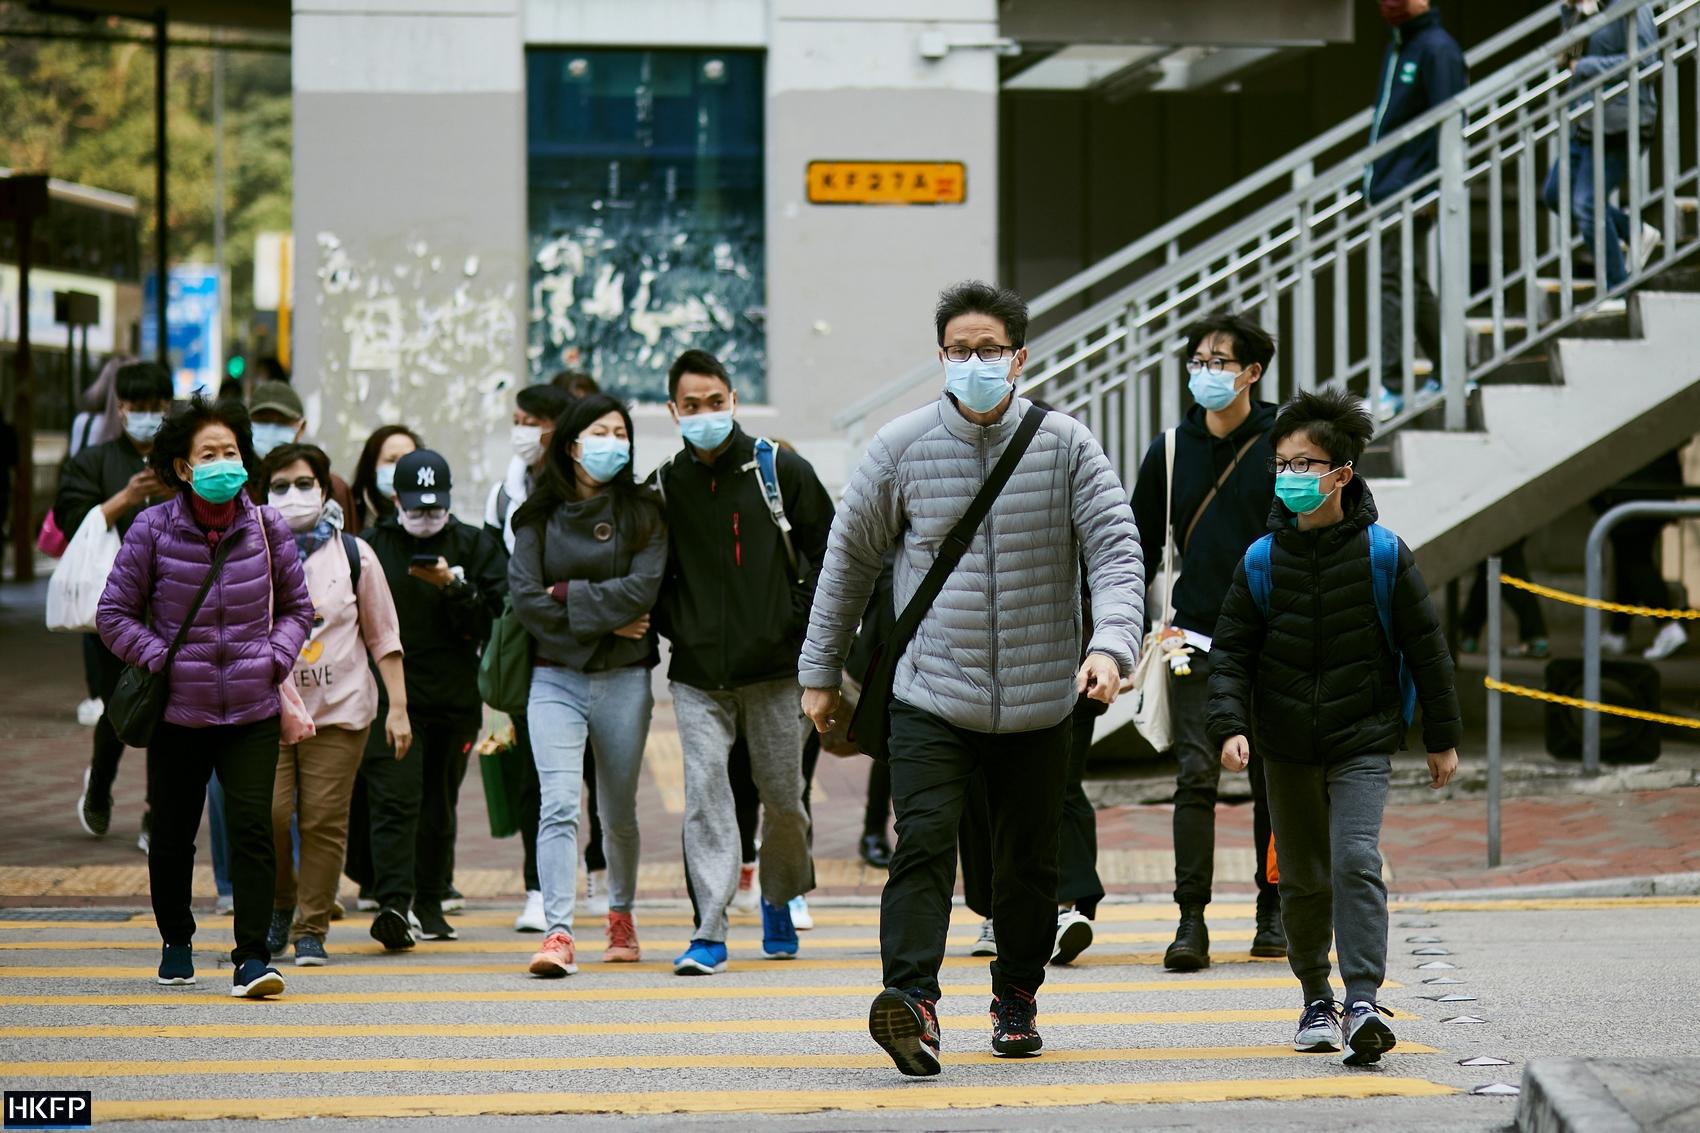 covid covid-19 coronavirus face masks streets